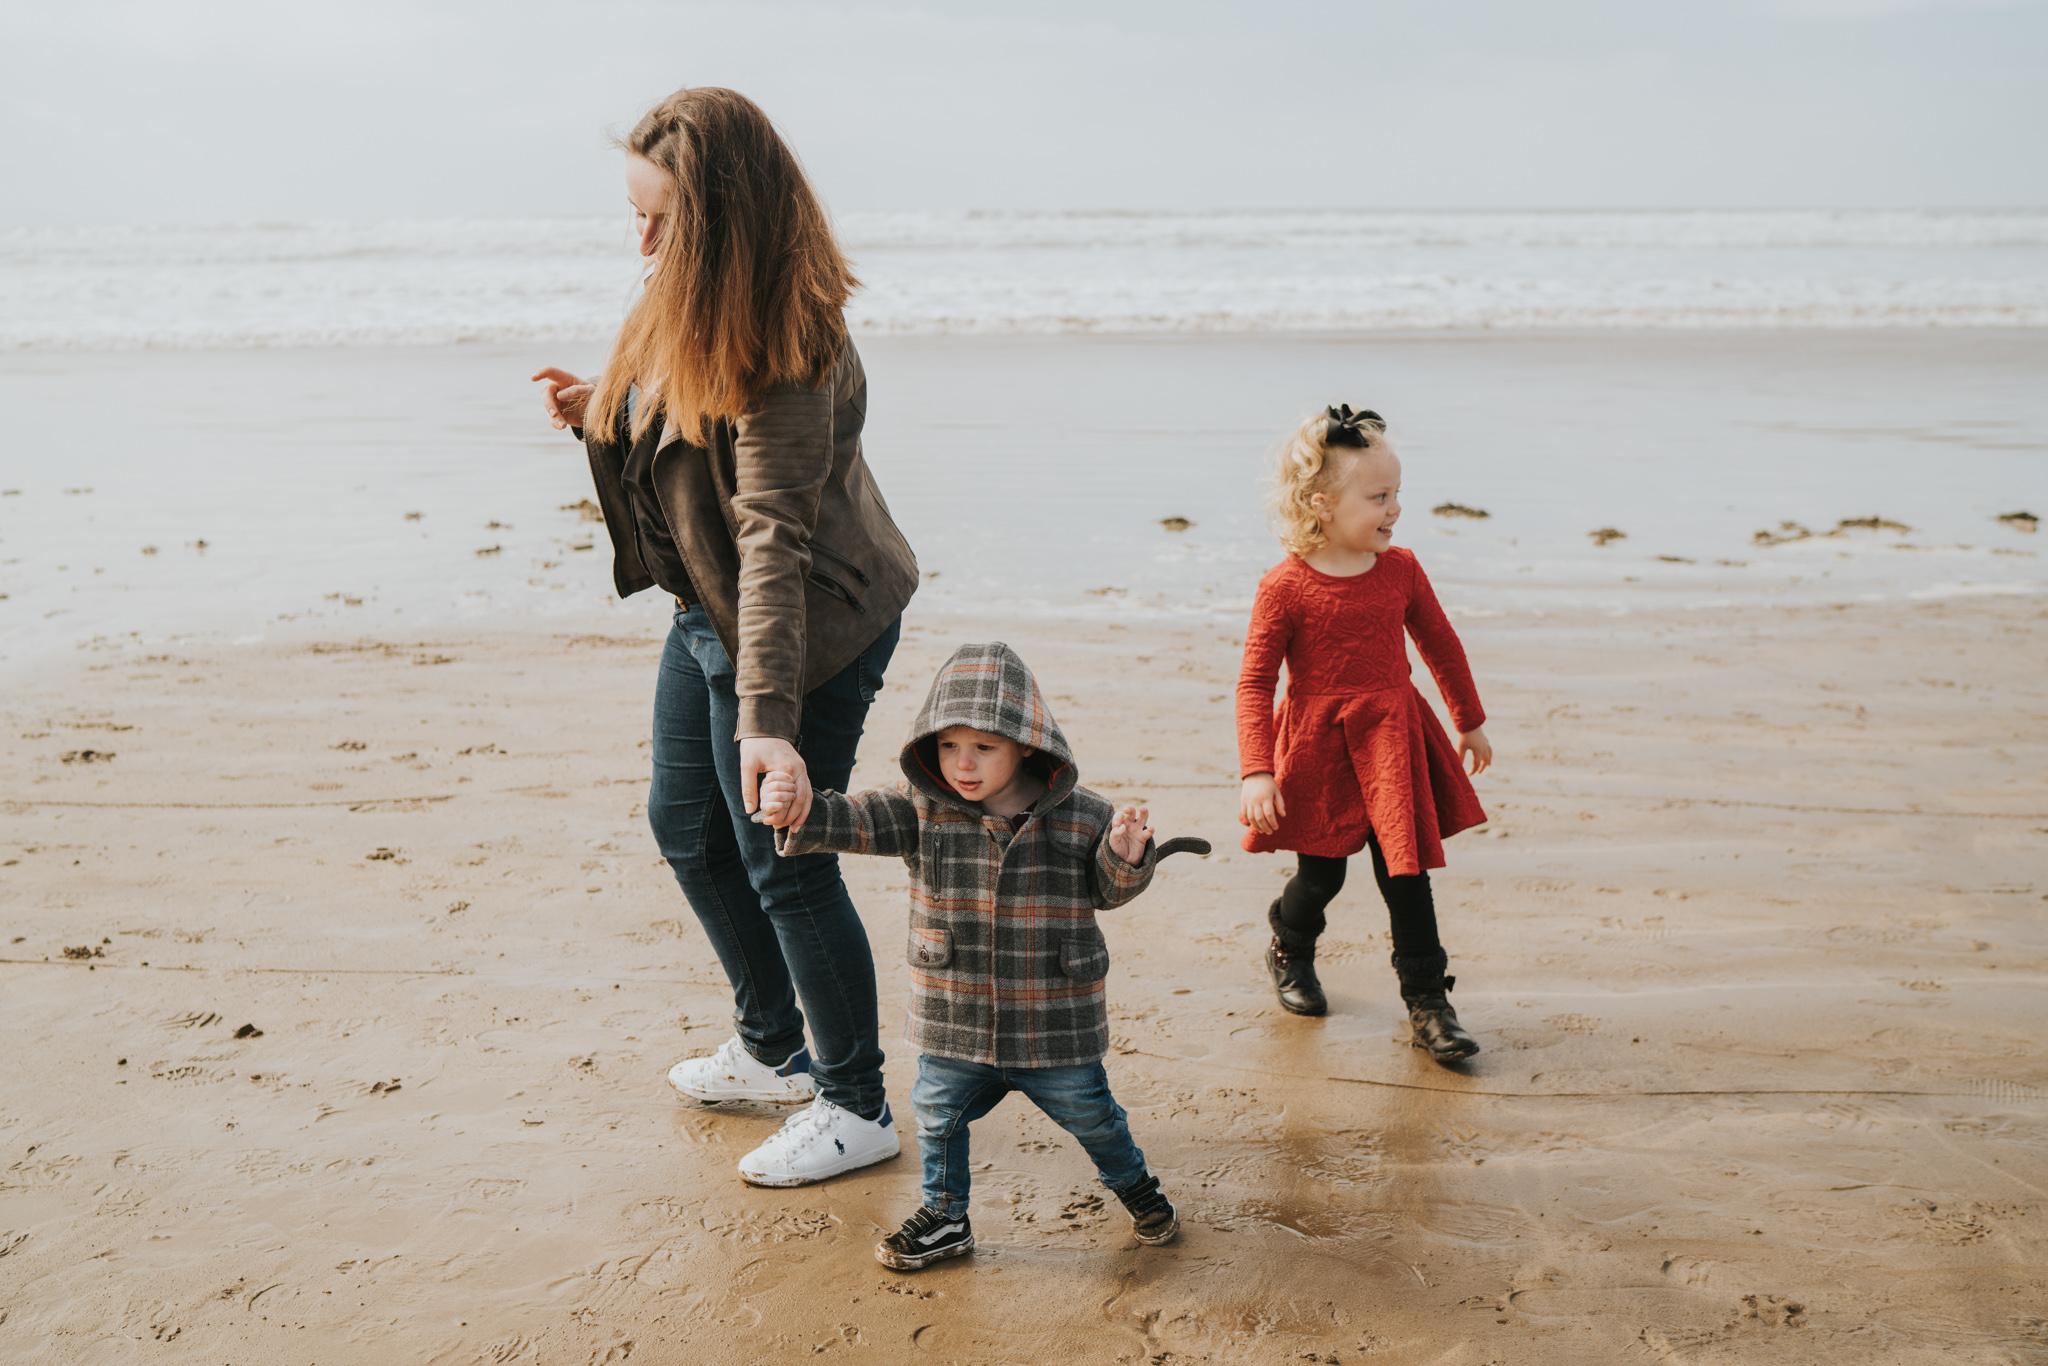 beach-family-session-westward-ho-north-devon-grace-elizabeth-devon-family-wedding-photographer-essex-devon-norfolk (15 of 43).jpg